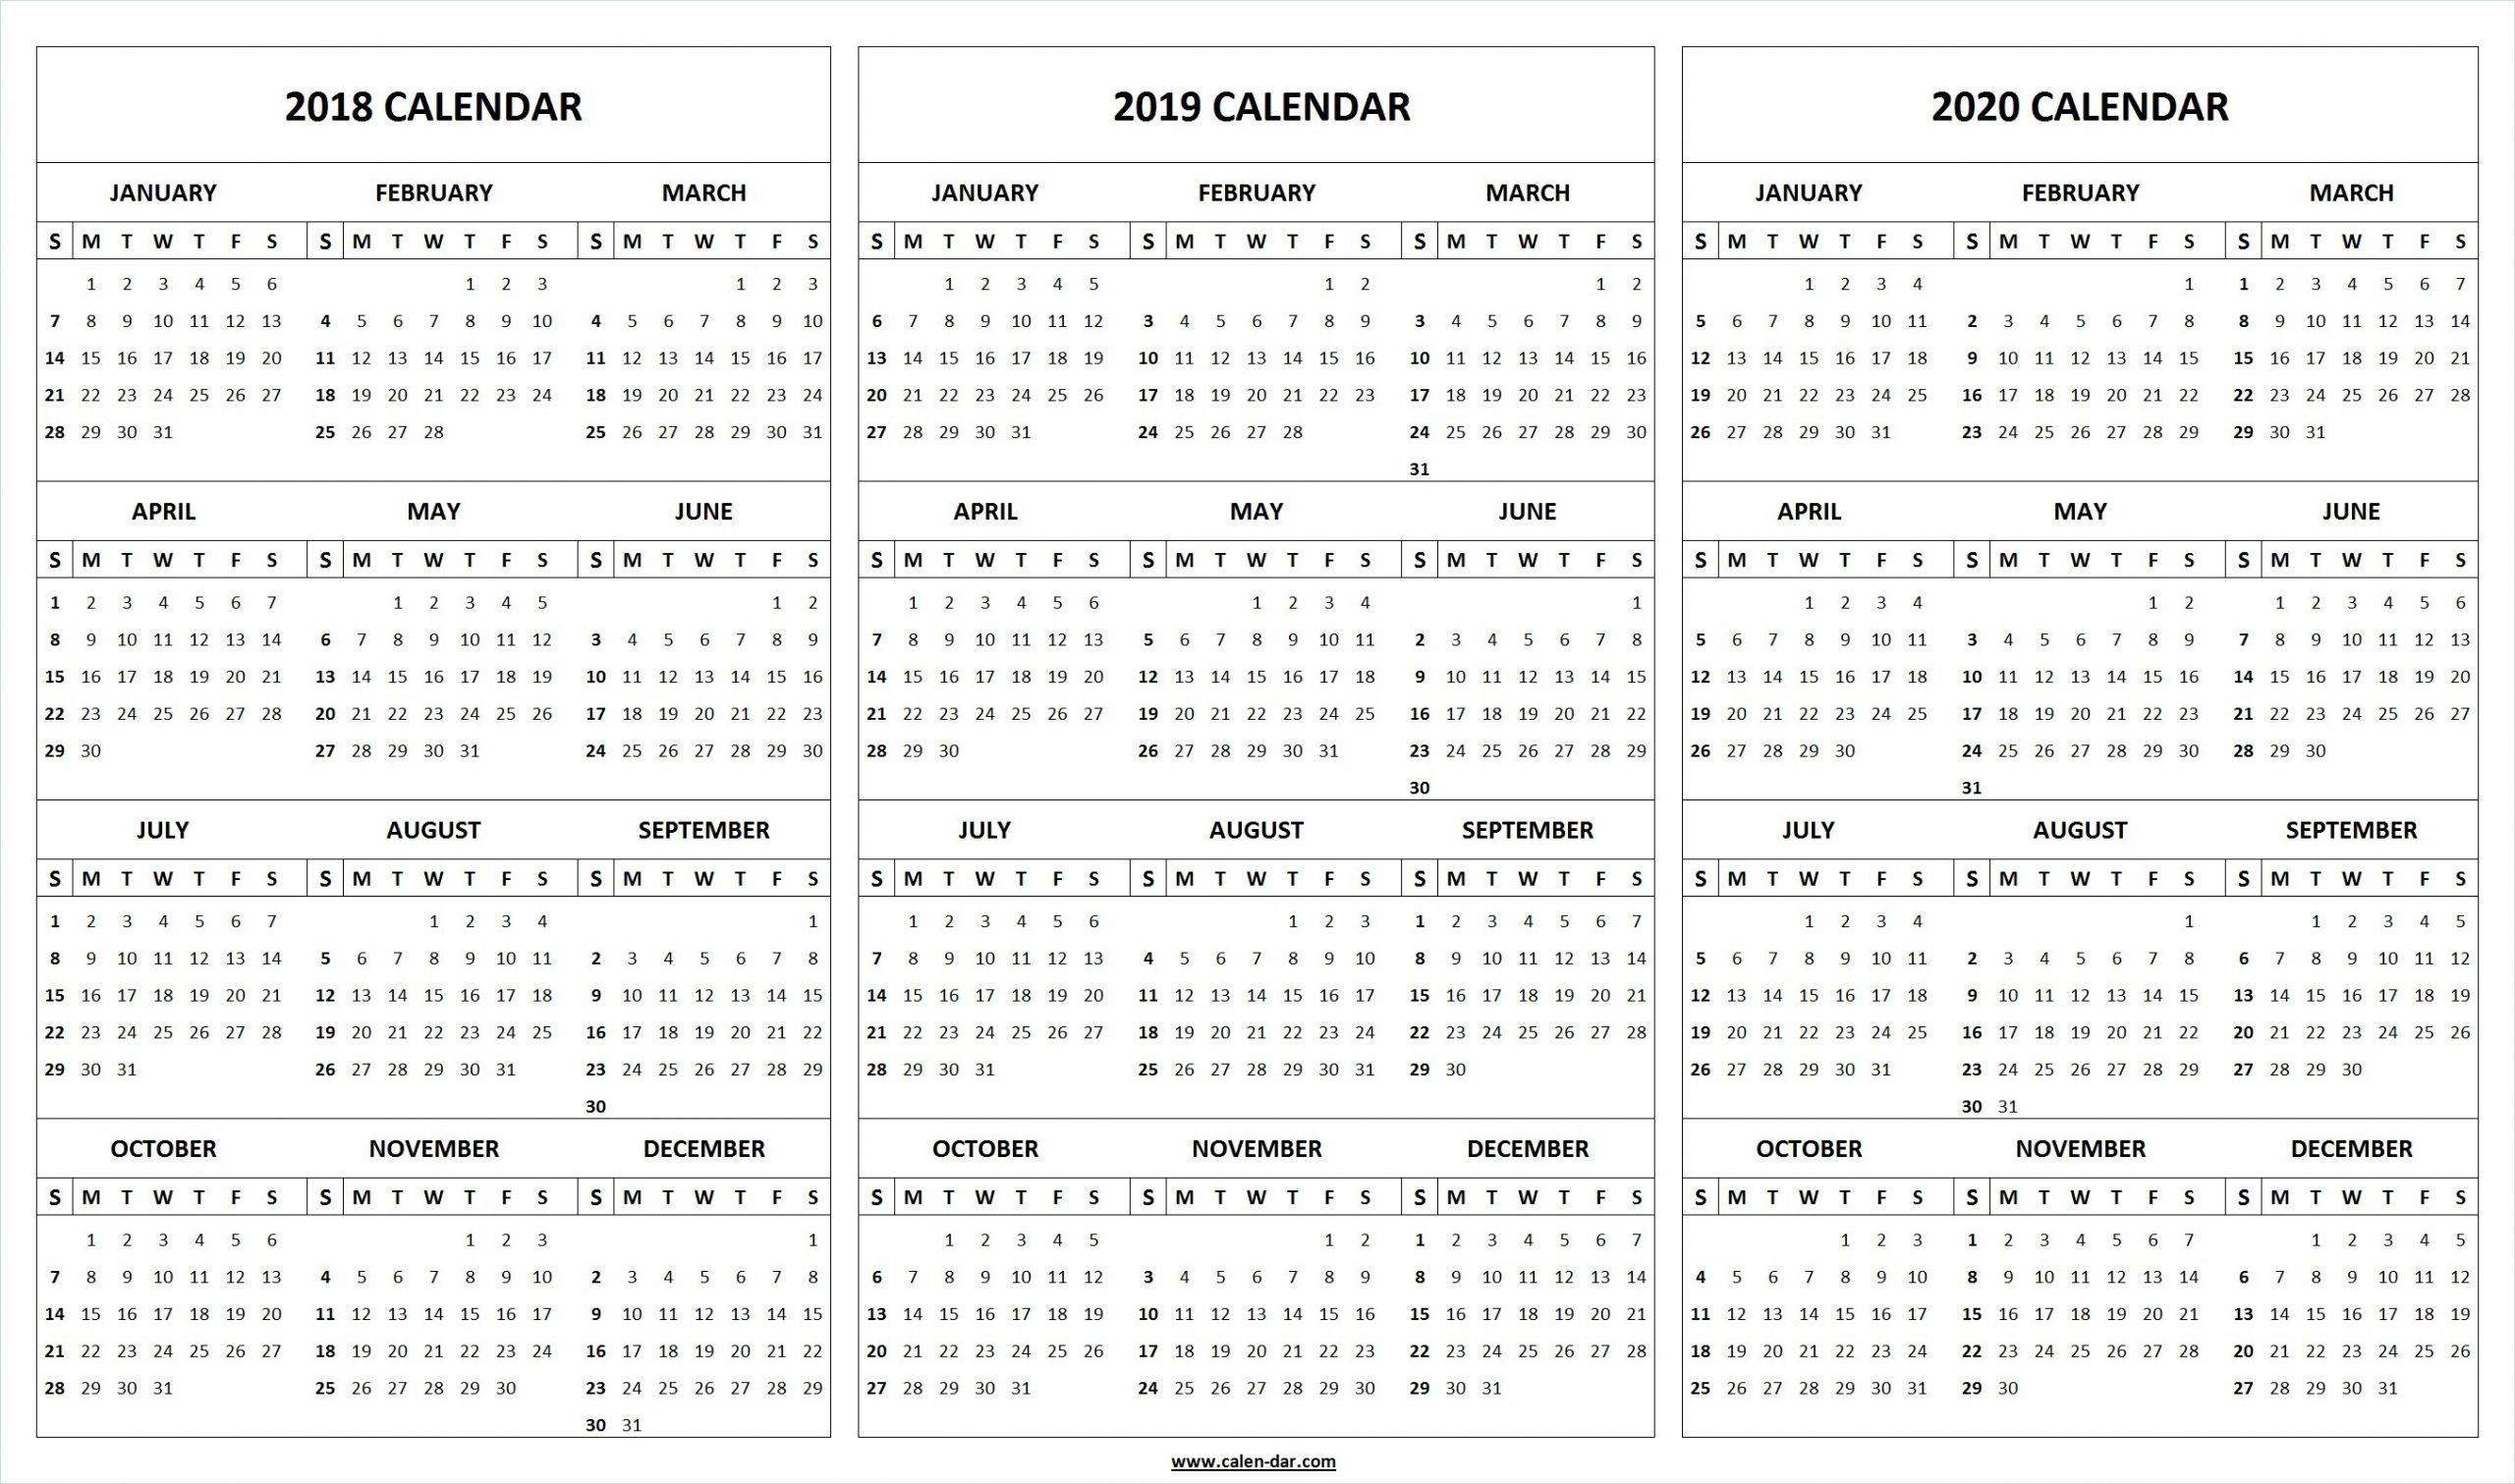 Printable 2018 2019 2020 Calendar Template | 3-Year Editable  Checkbook Size Calendar Printable